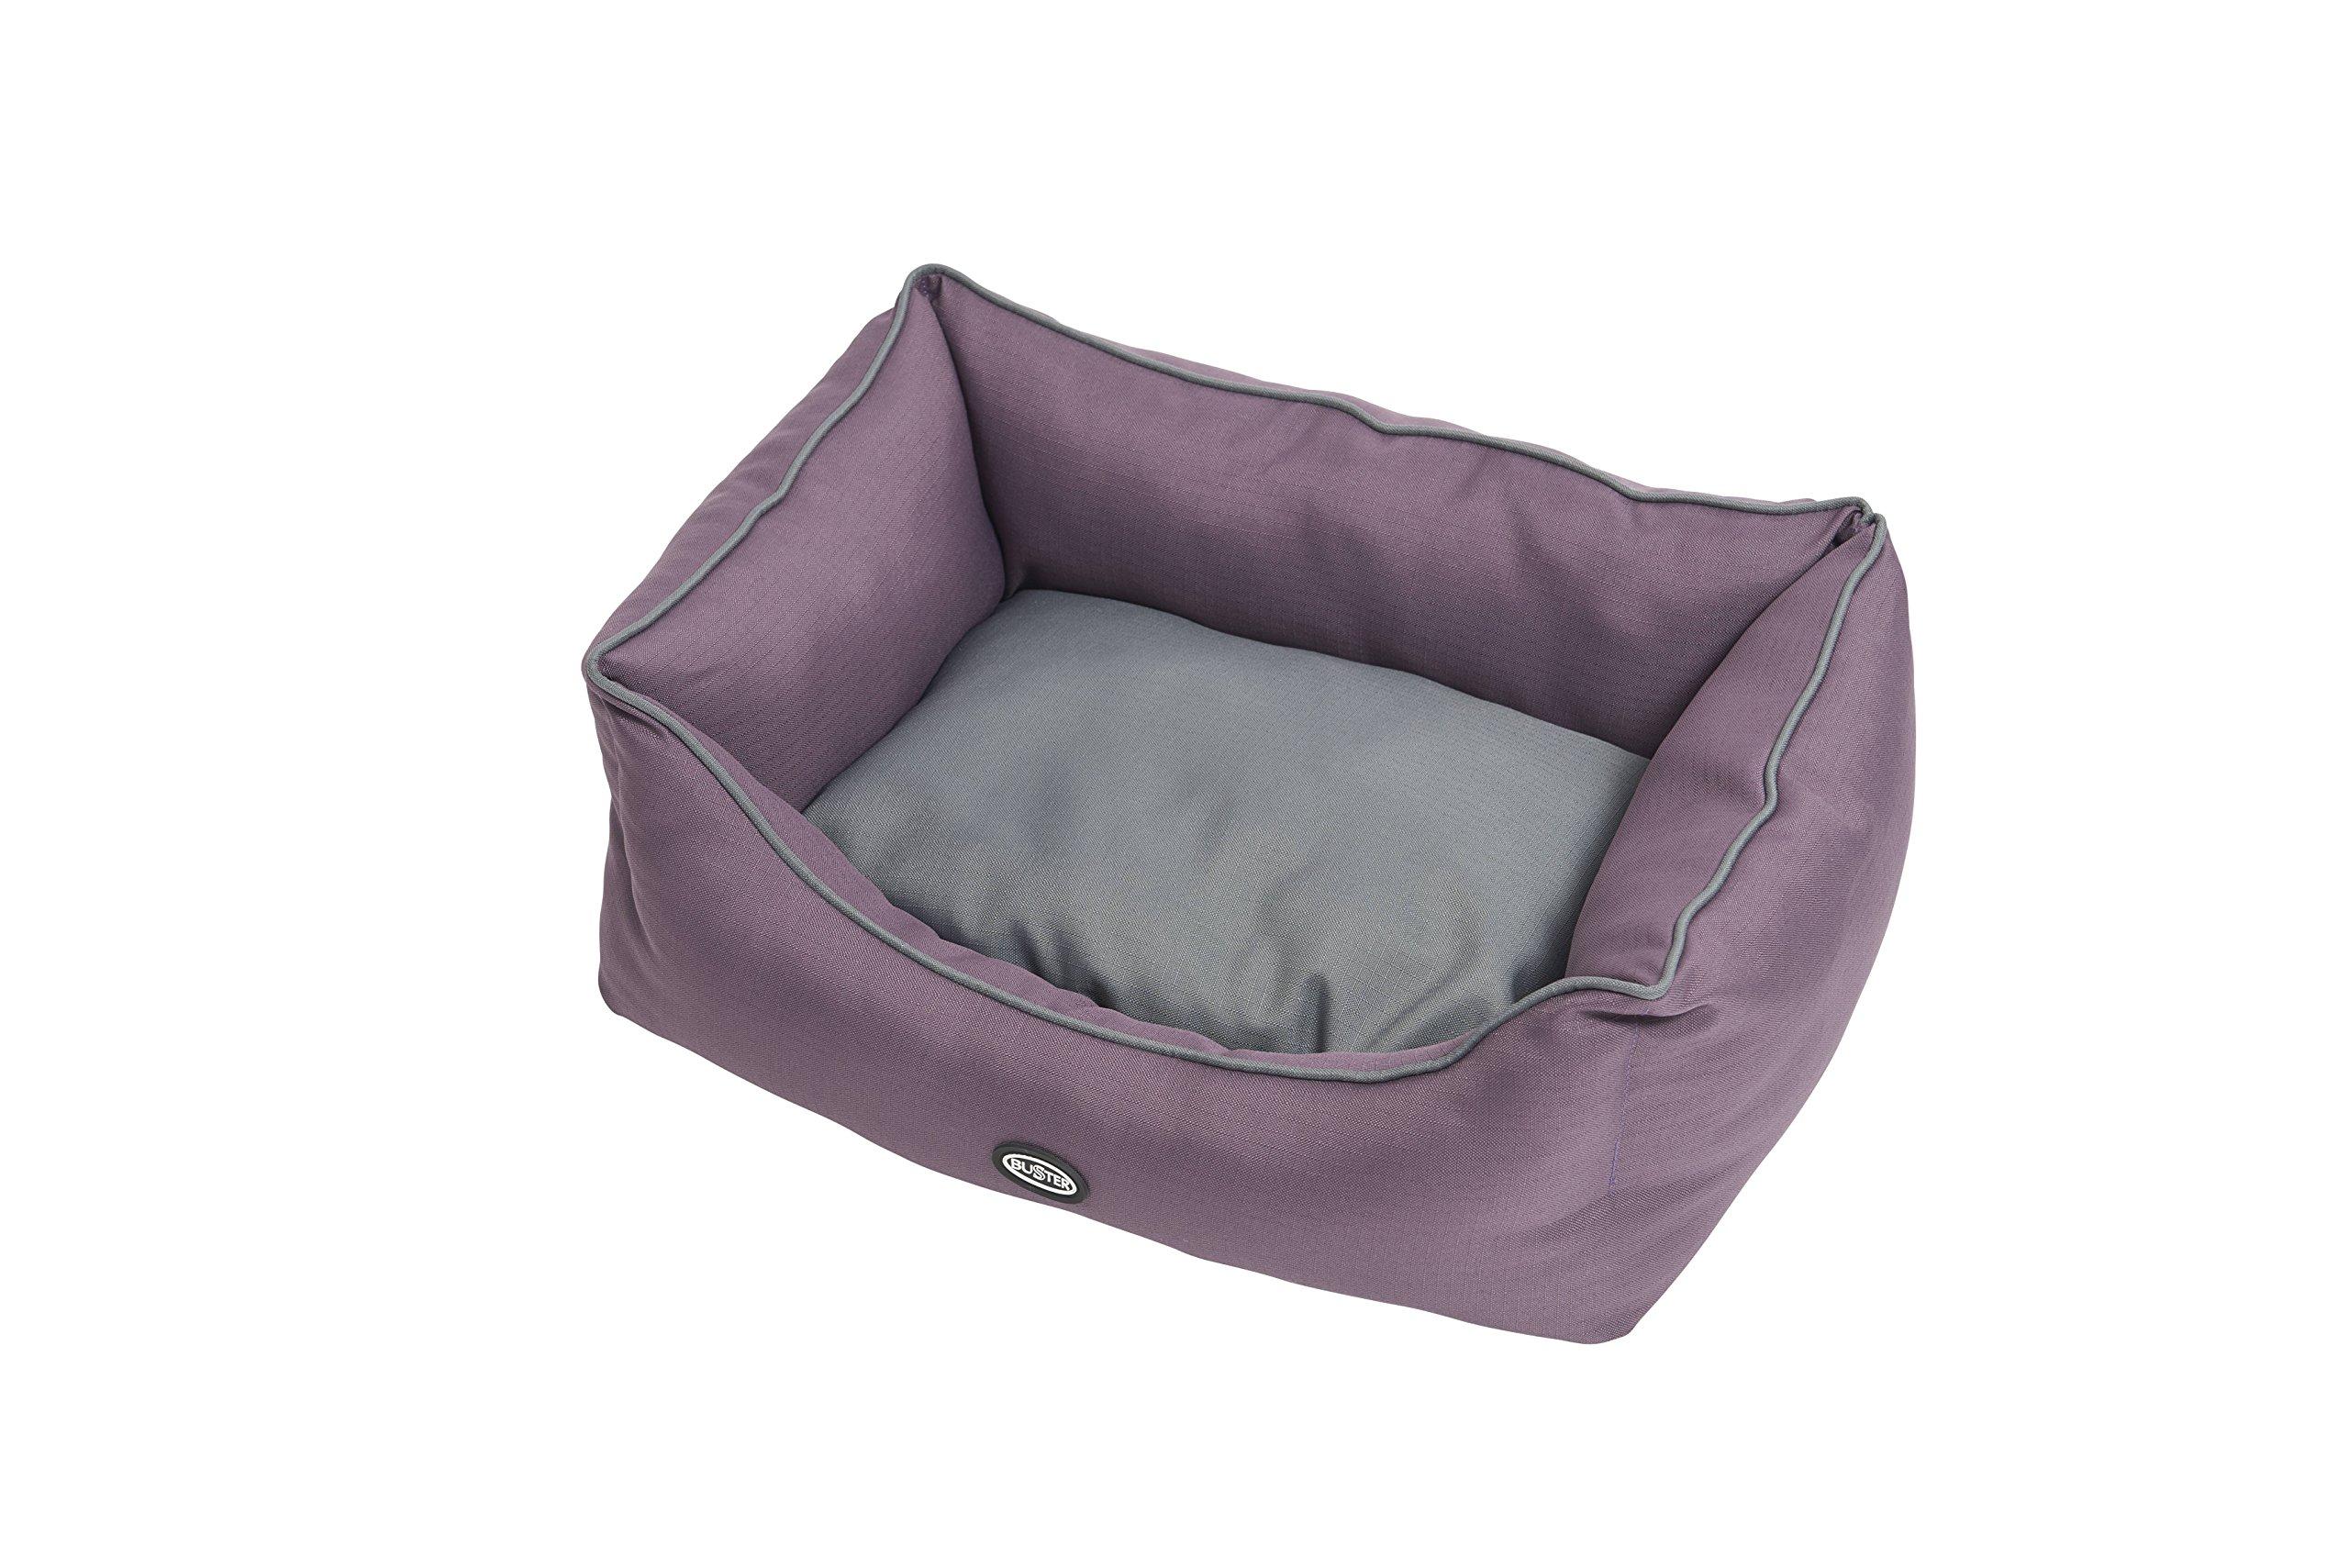 Kruuse Buster Sofa Bed, Black Plum/Steel Grey, 45 x 24''